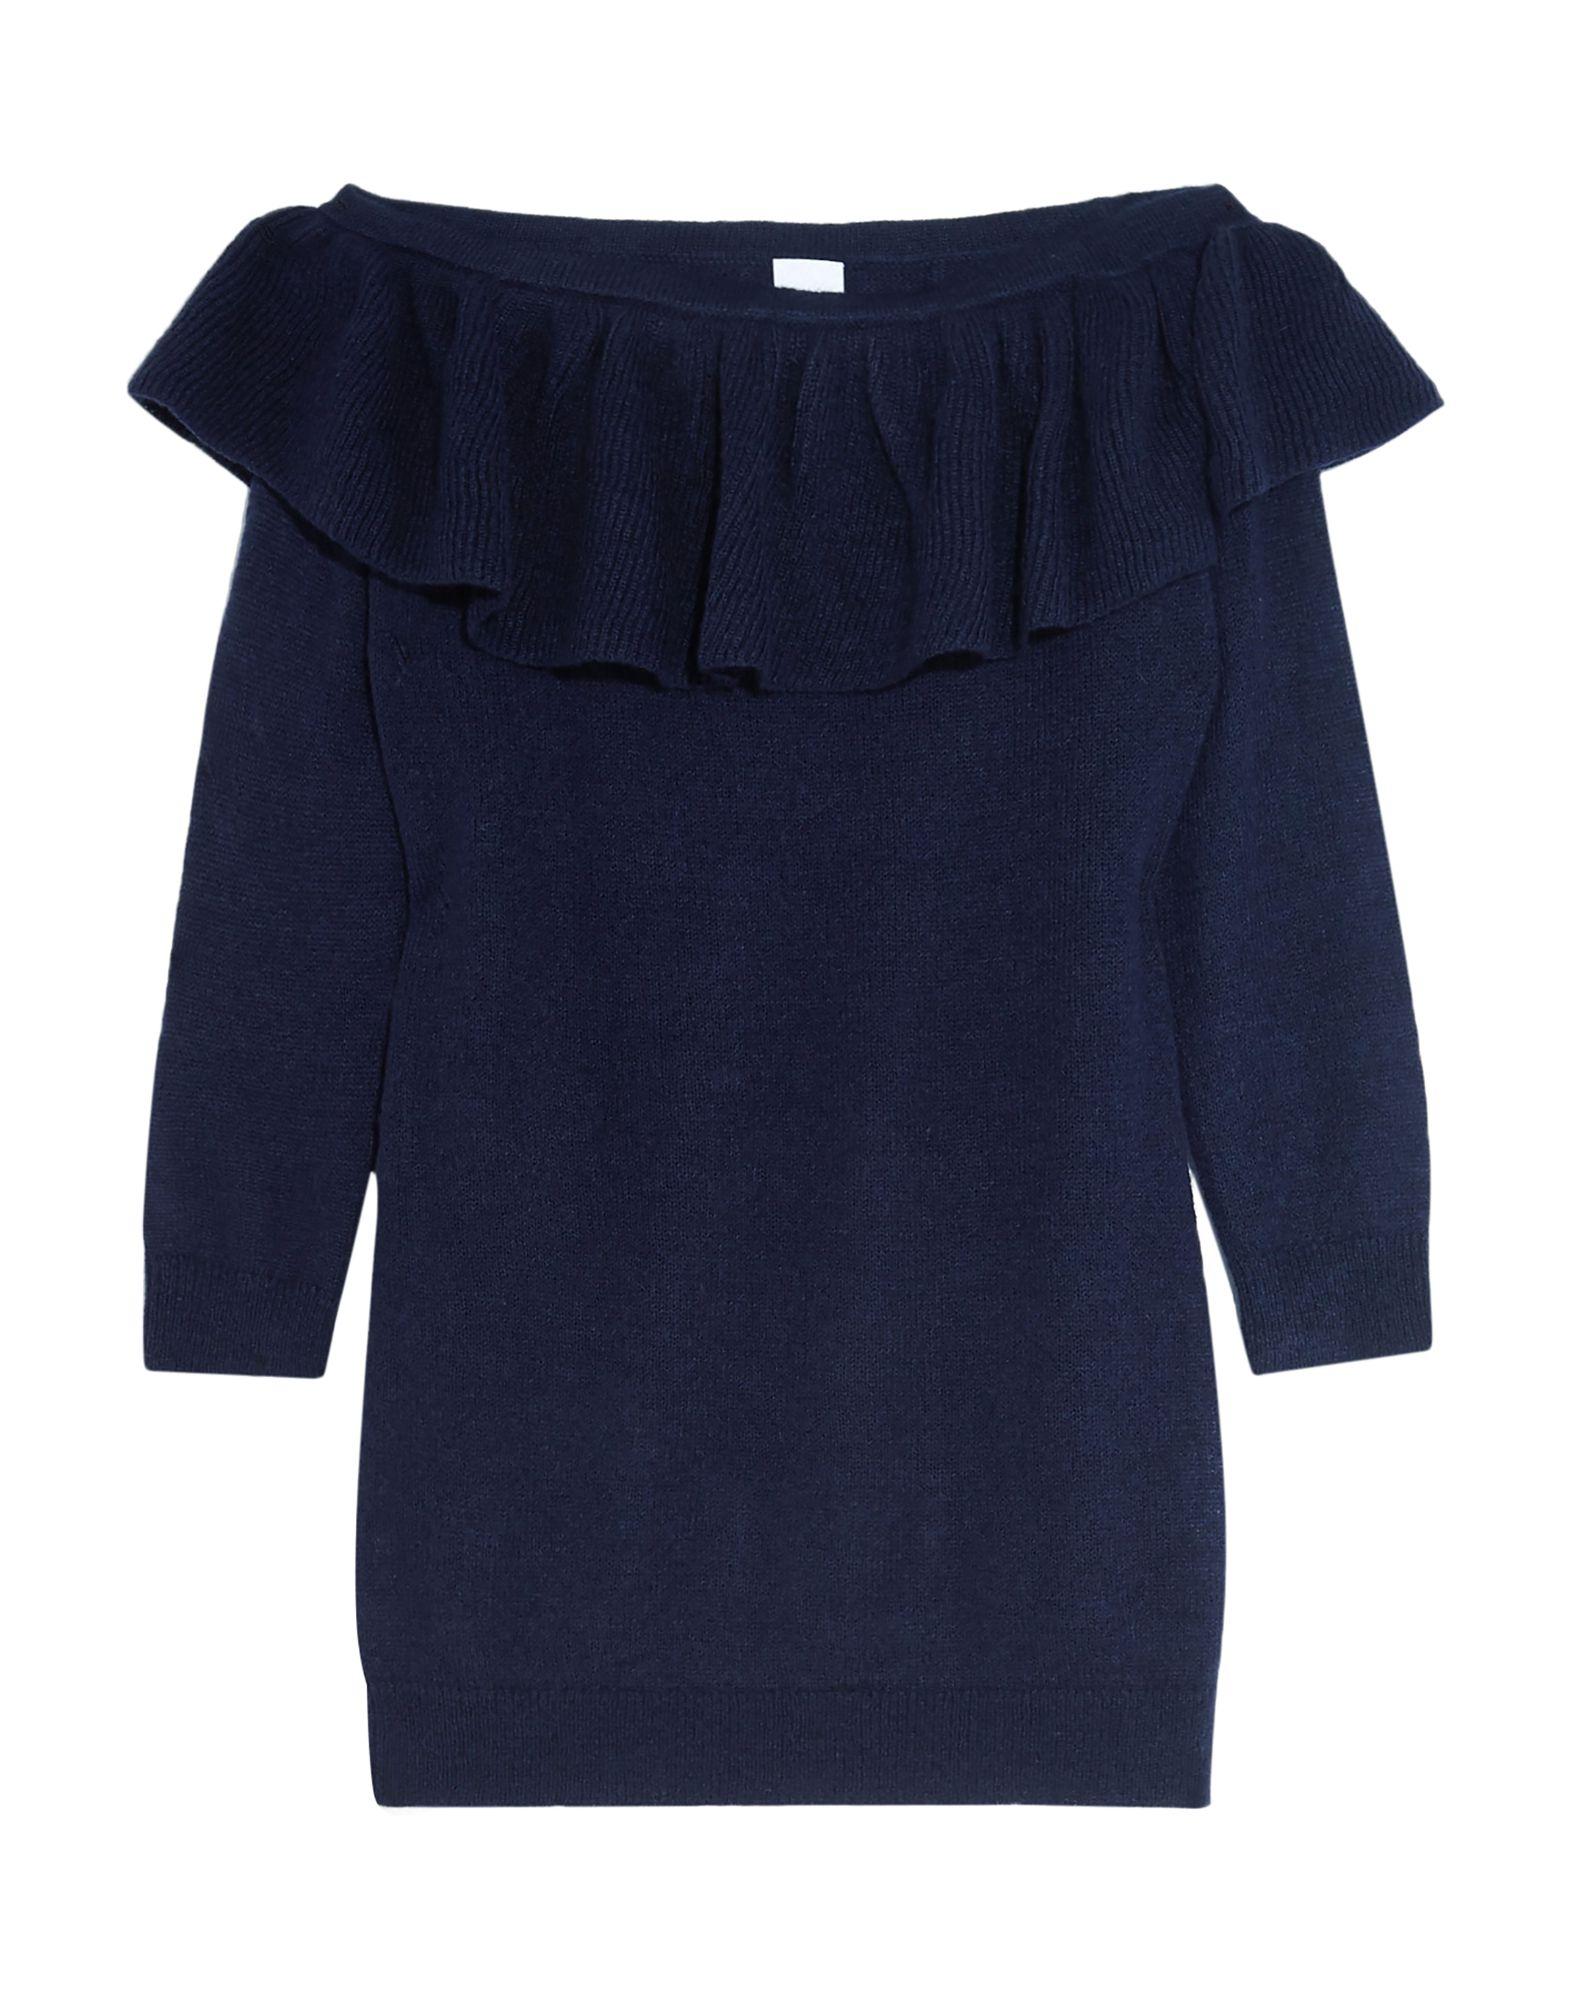 IRIS & INK Sweaters - Item 39976403